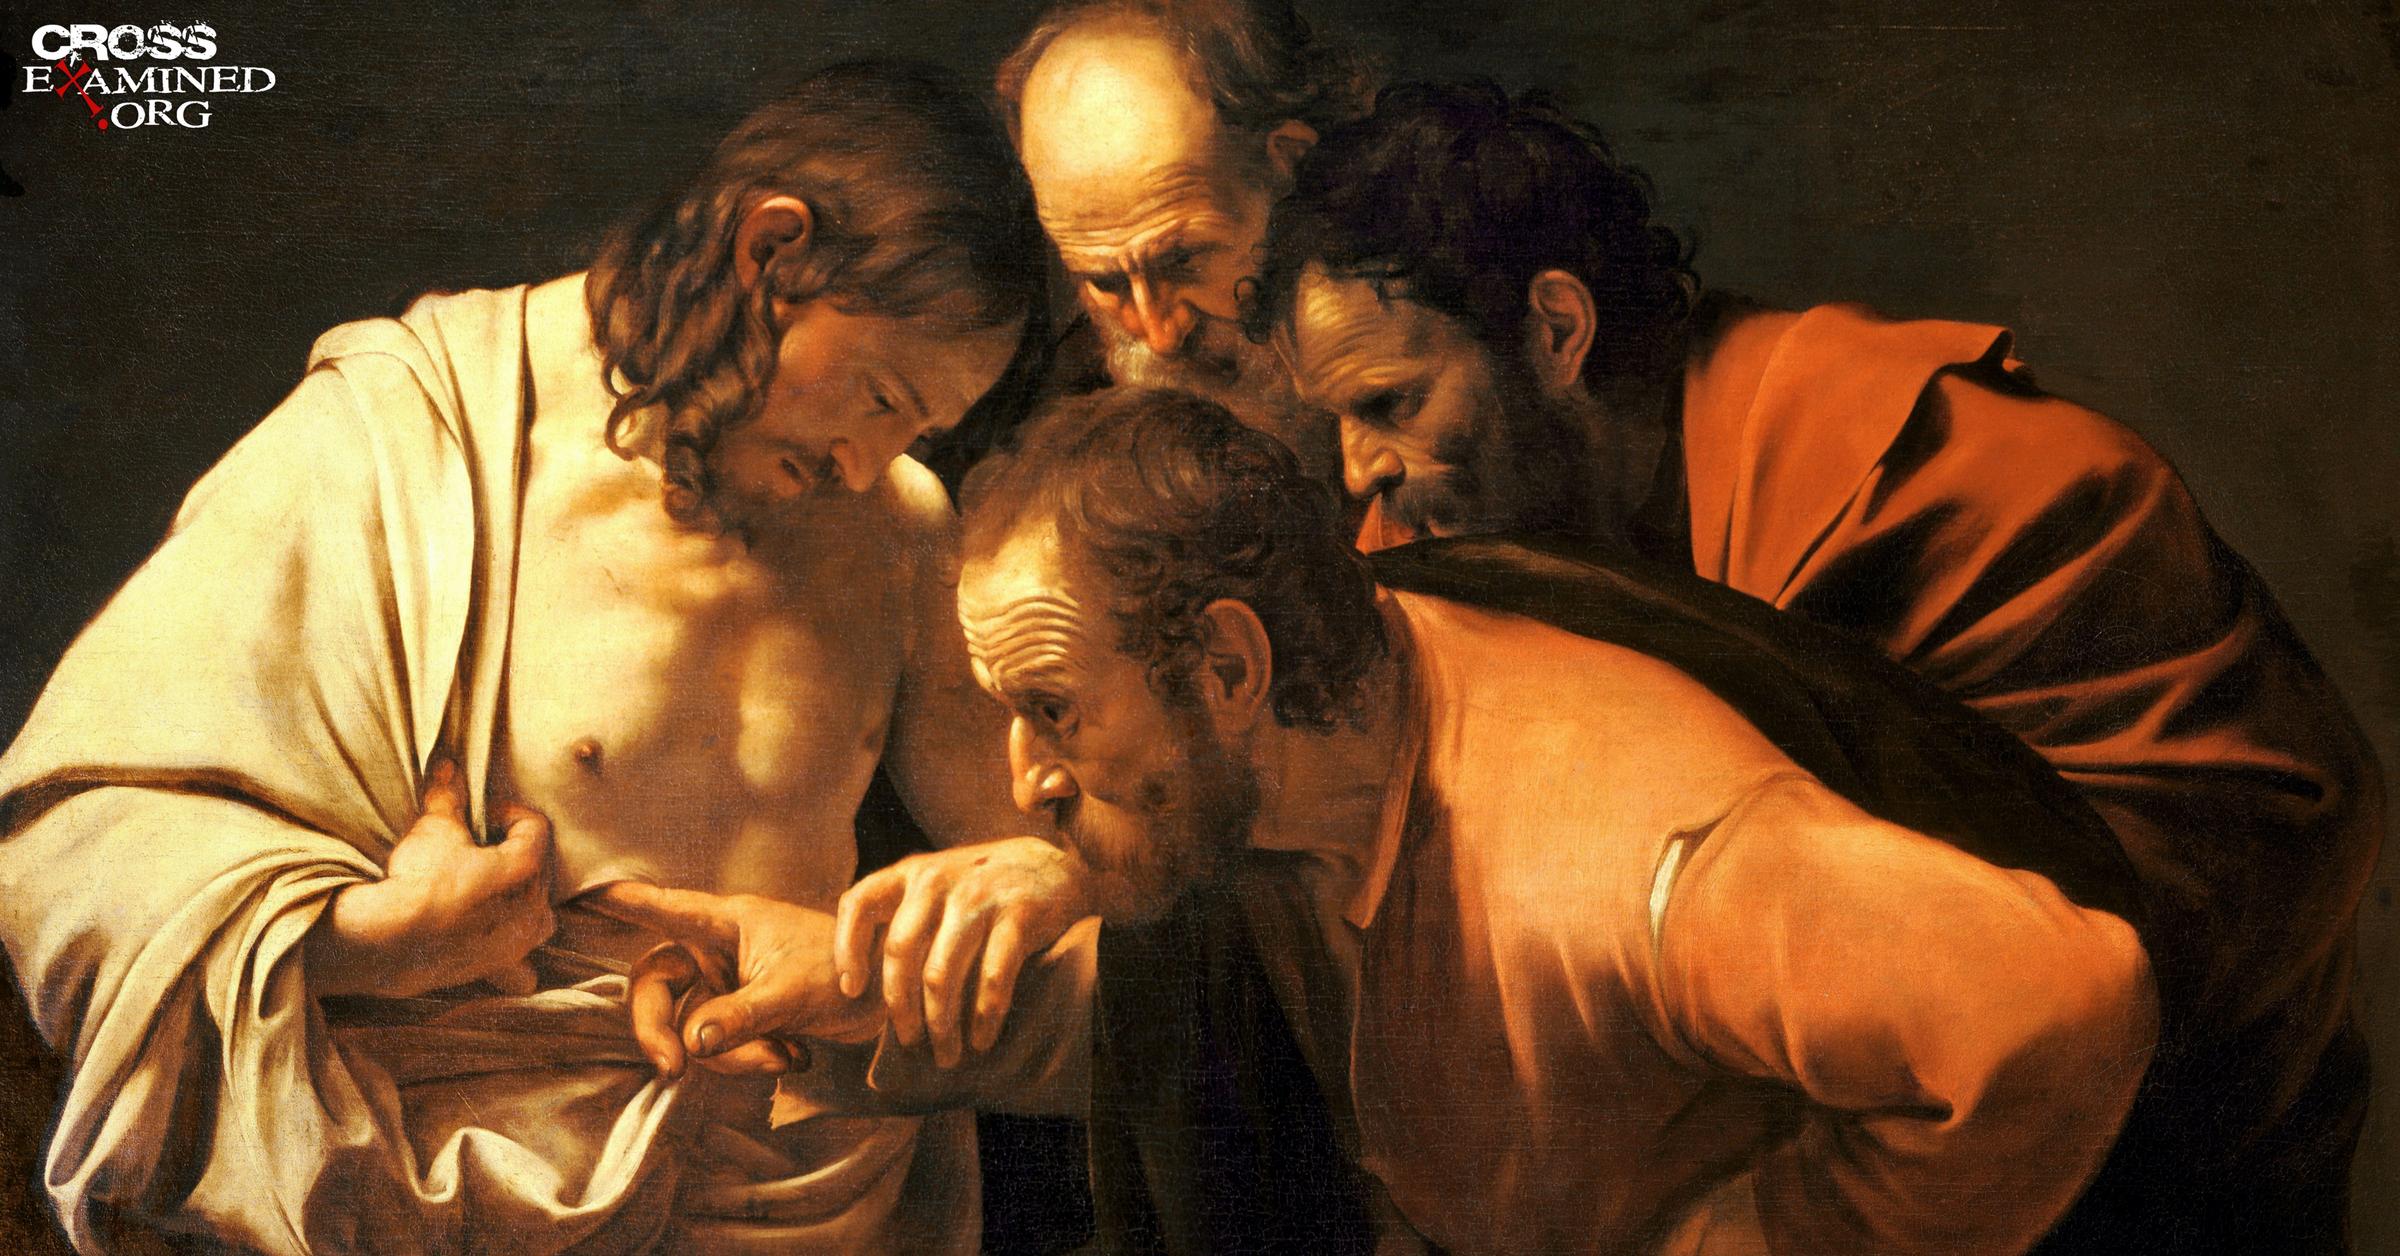 DID THE DISCIPLES LIE ABOUT JESUS' RESURRECTION